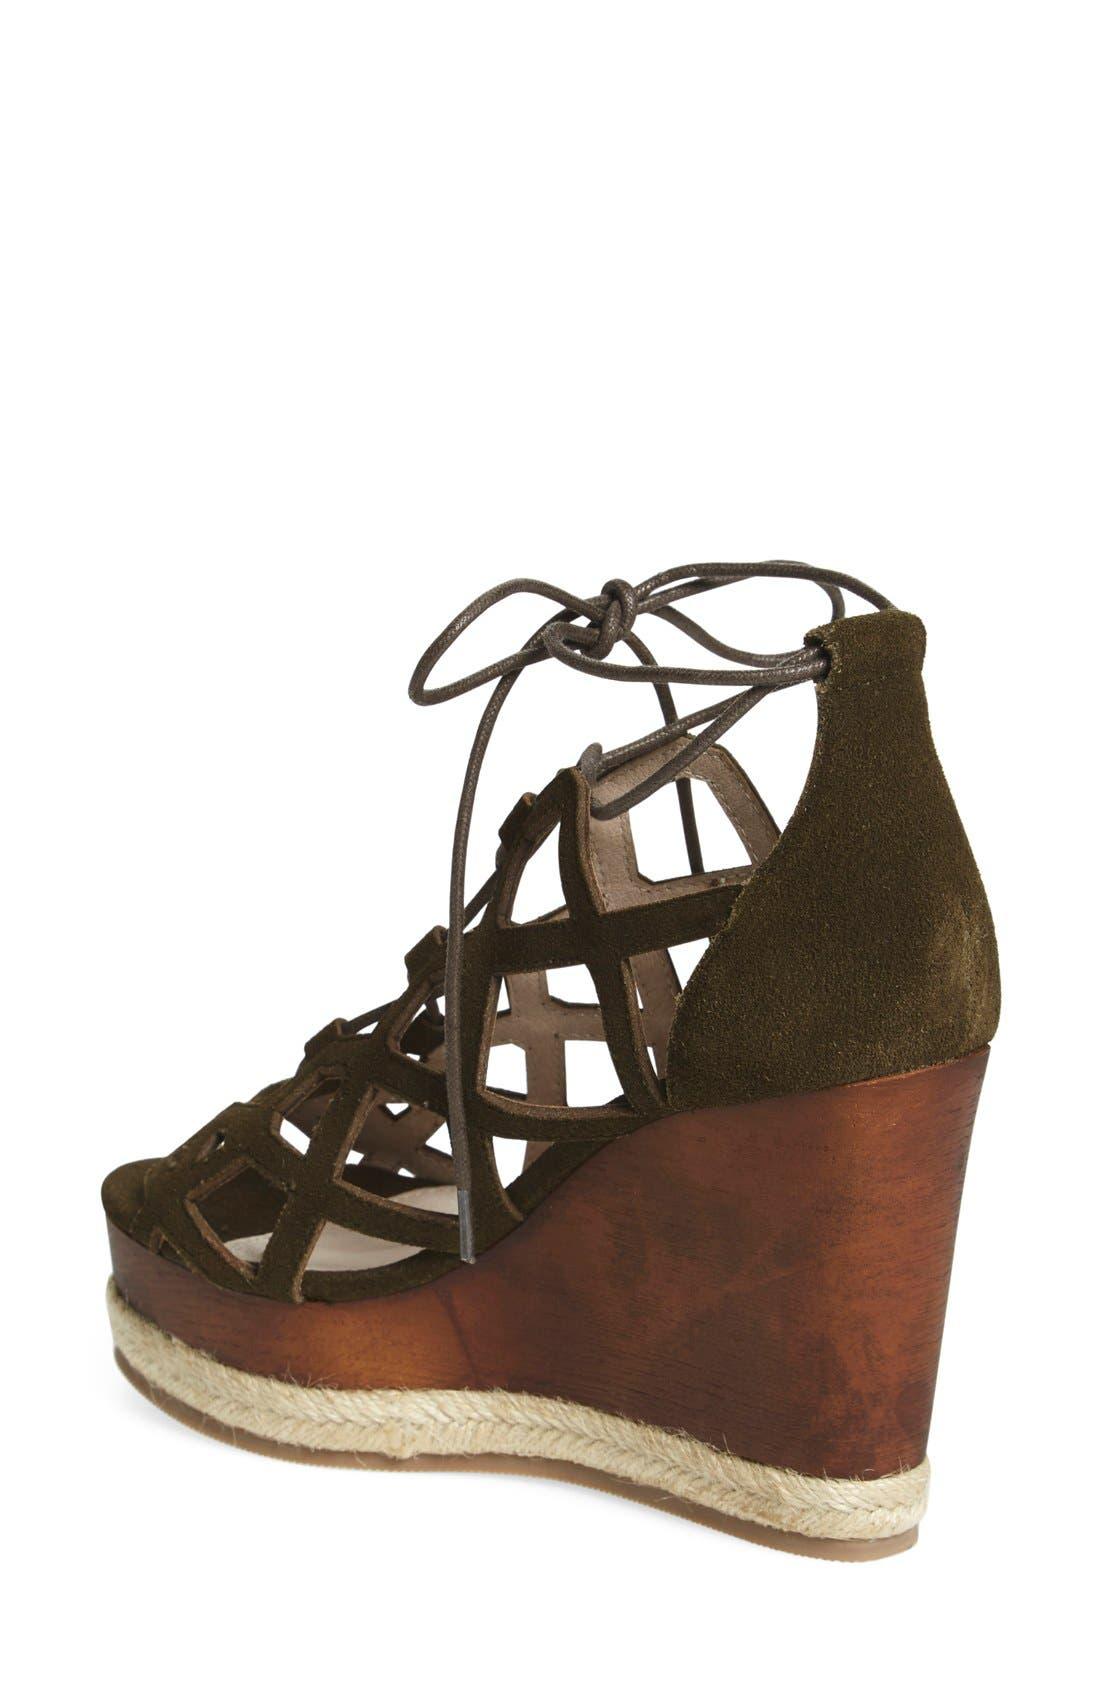 Alternate Image 2  - Shellys London 'Emerald' Wedge Sandal (Women)